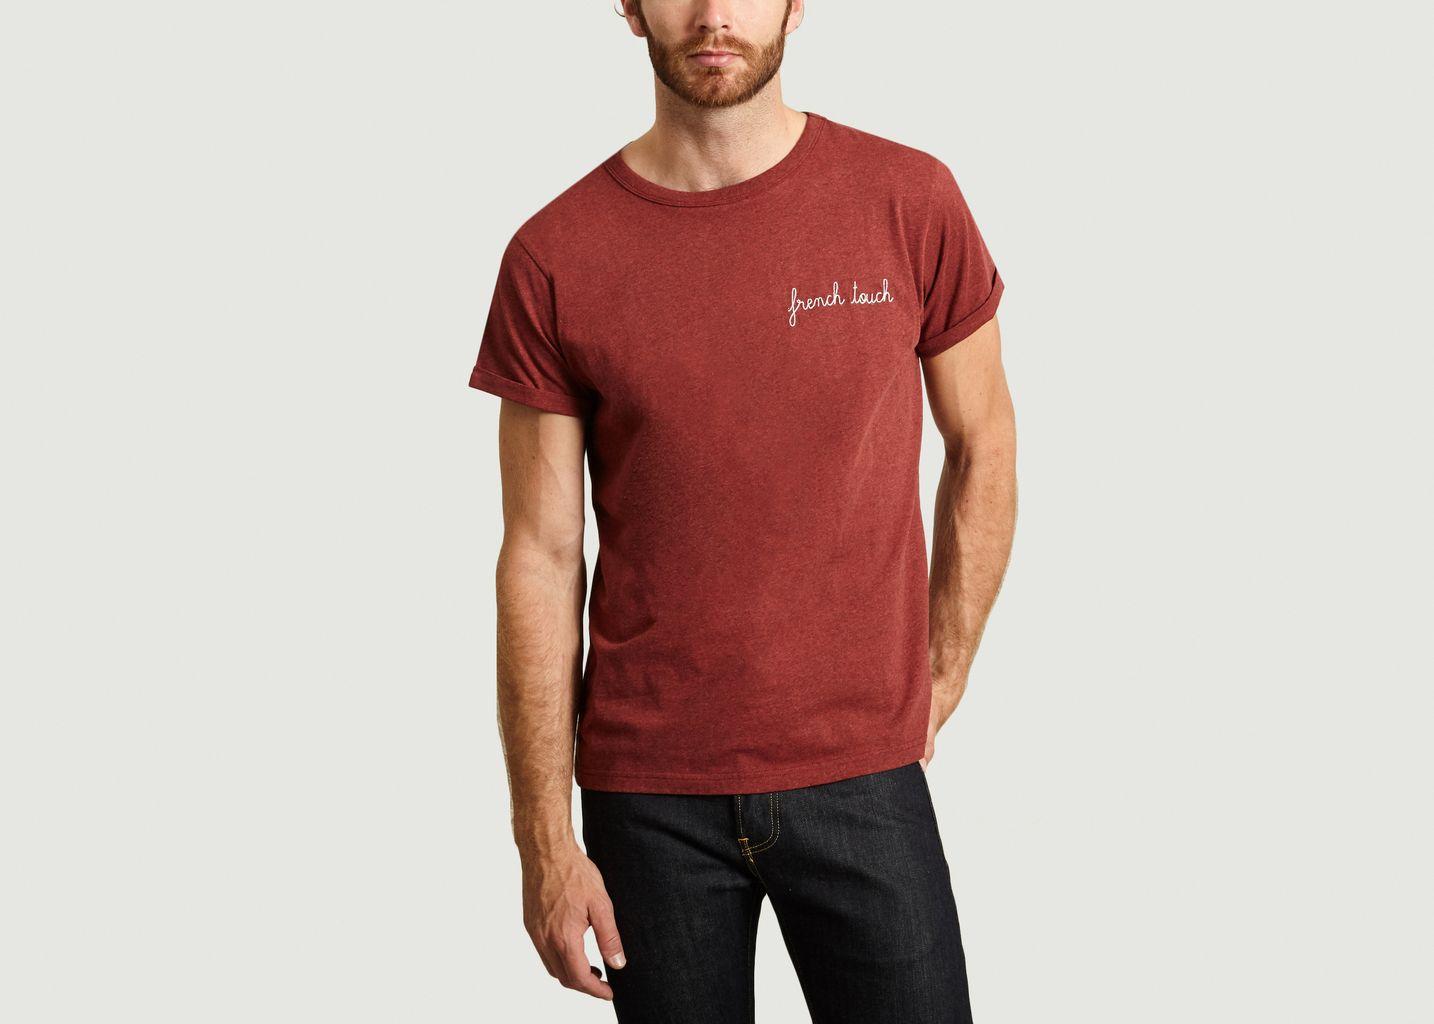 T-shirt French Touch - Maison Labiche